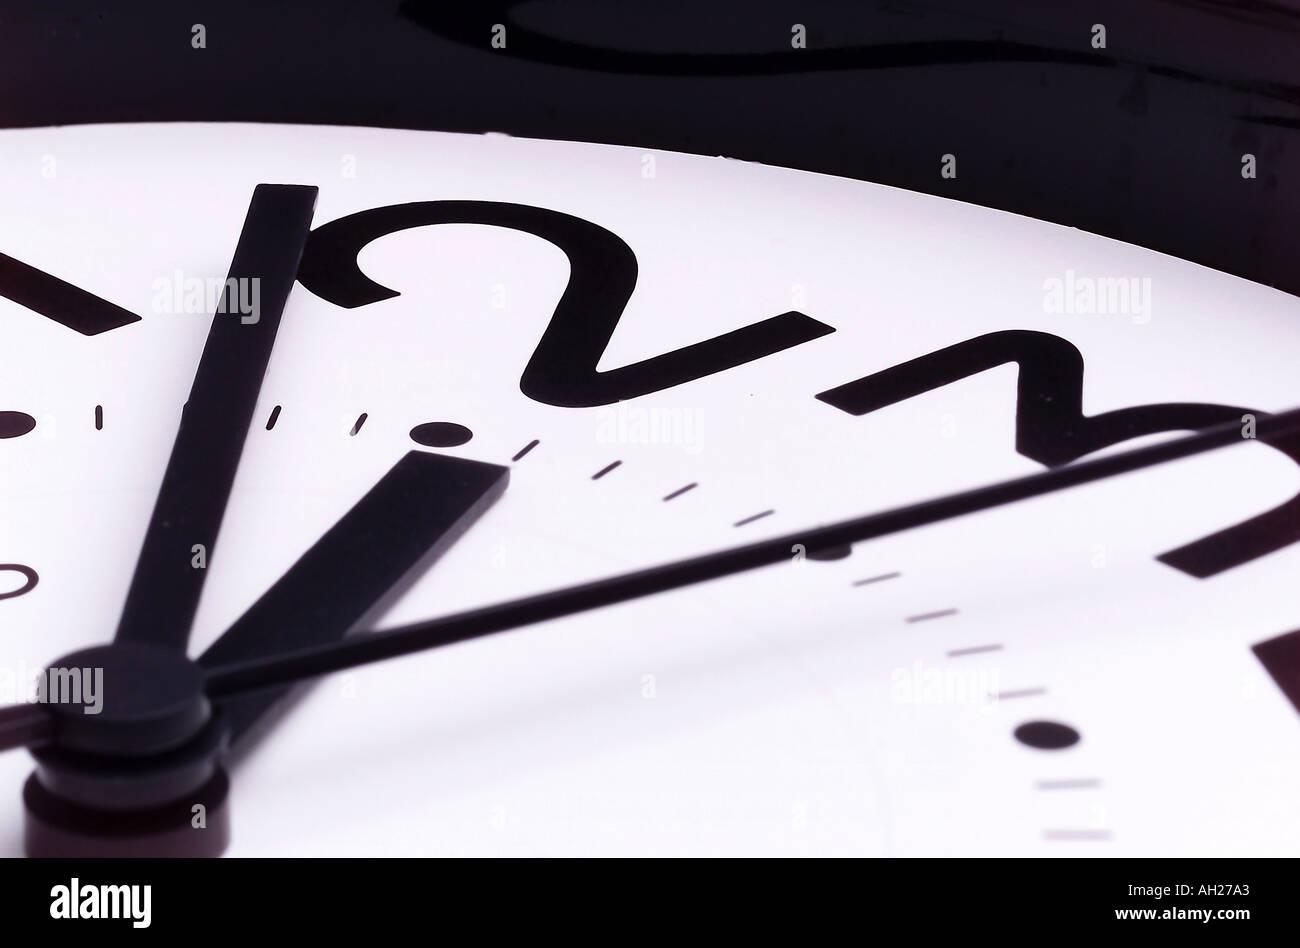 Clock hands at 2:07 - Stock Image